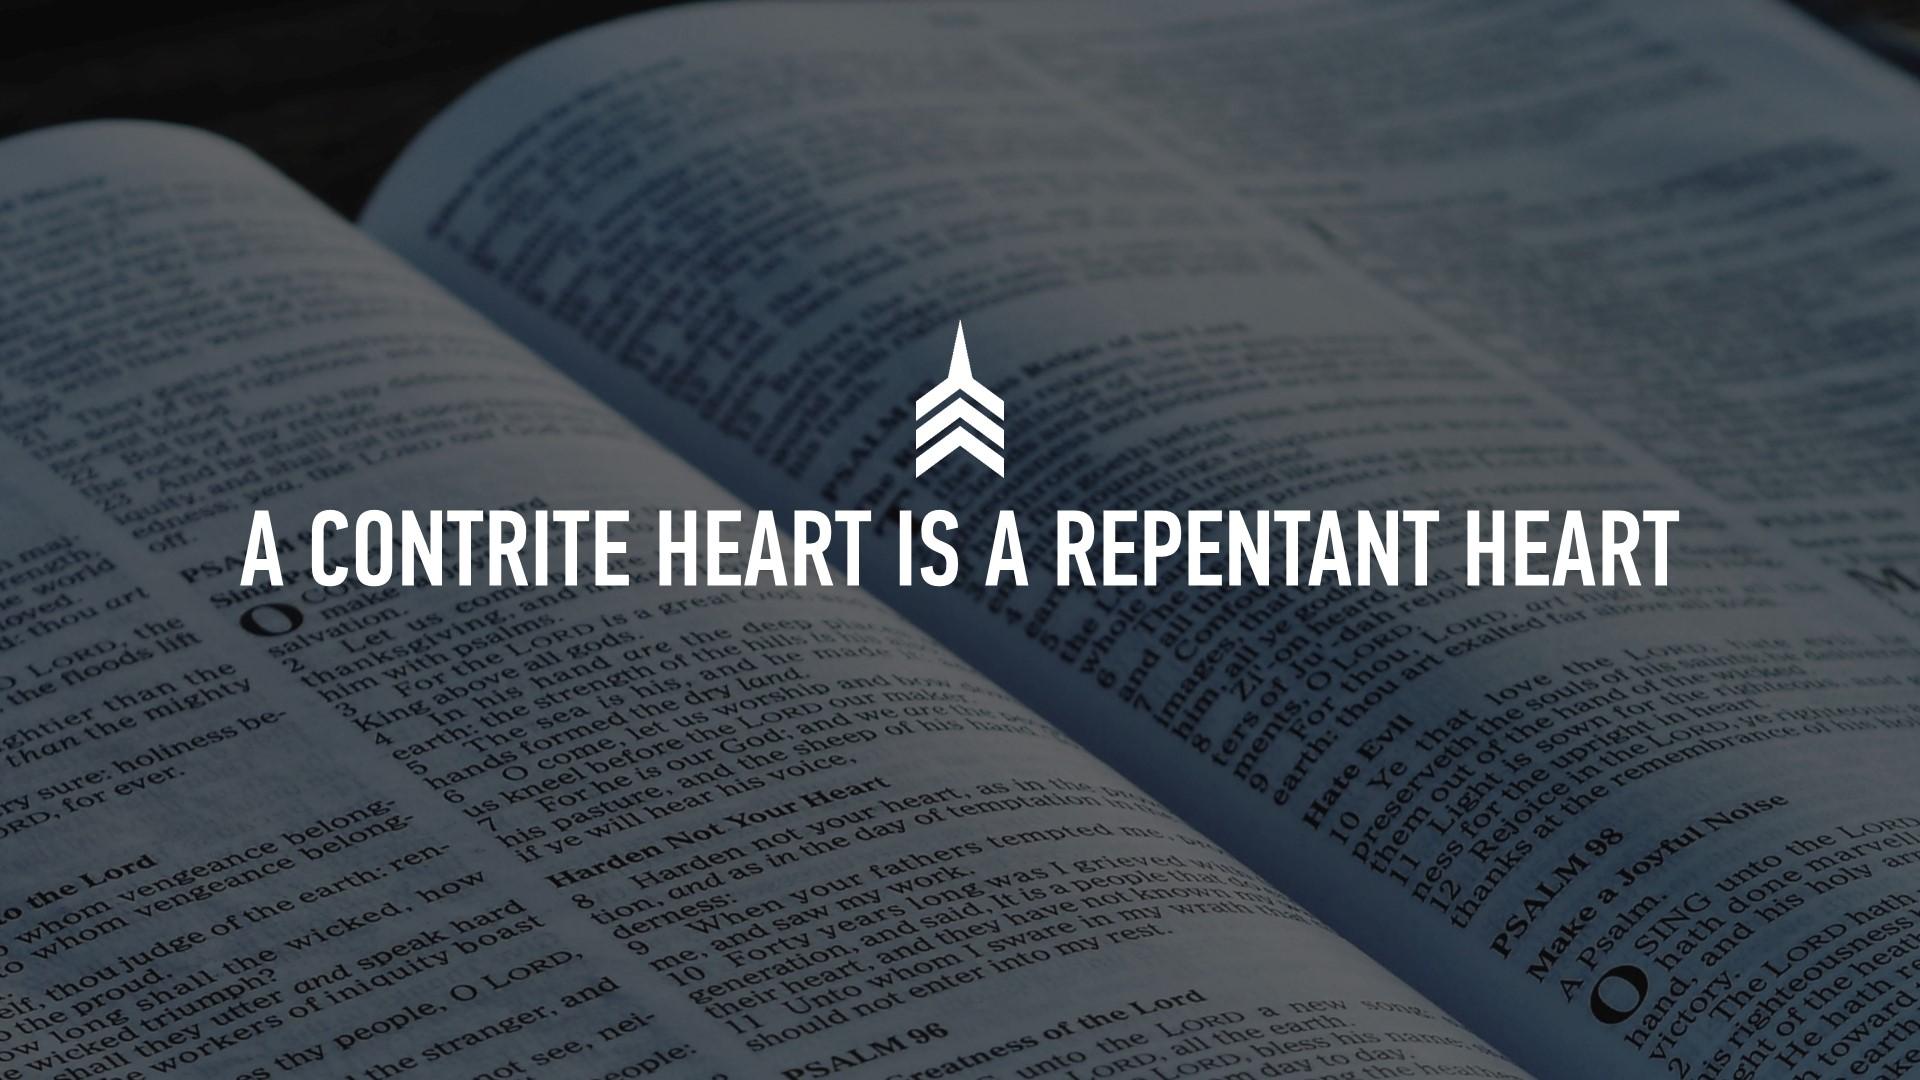 20190609 A CONTRITE HEART IS A REPENTANT HEART.JPG